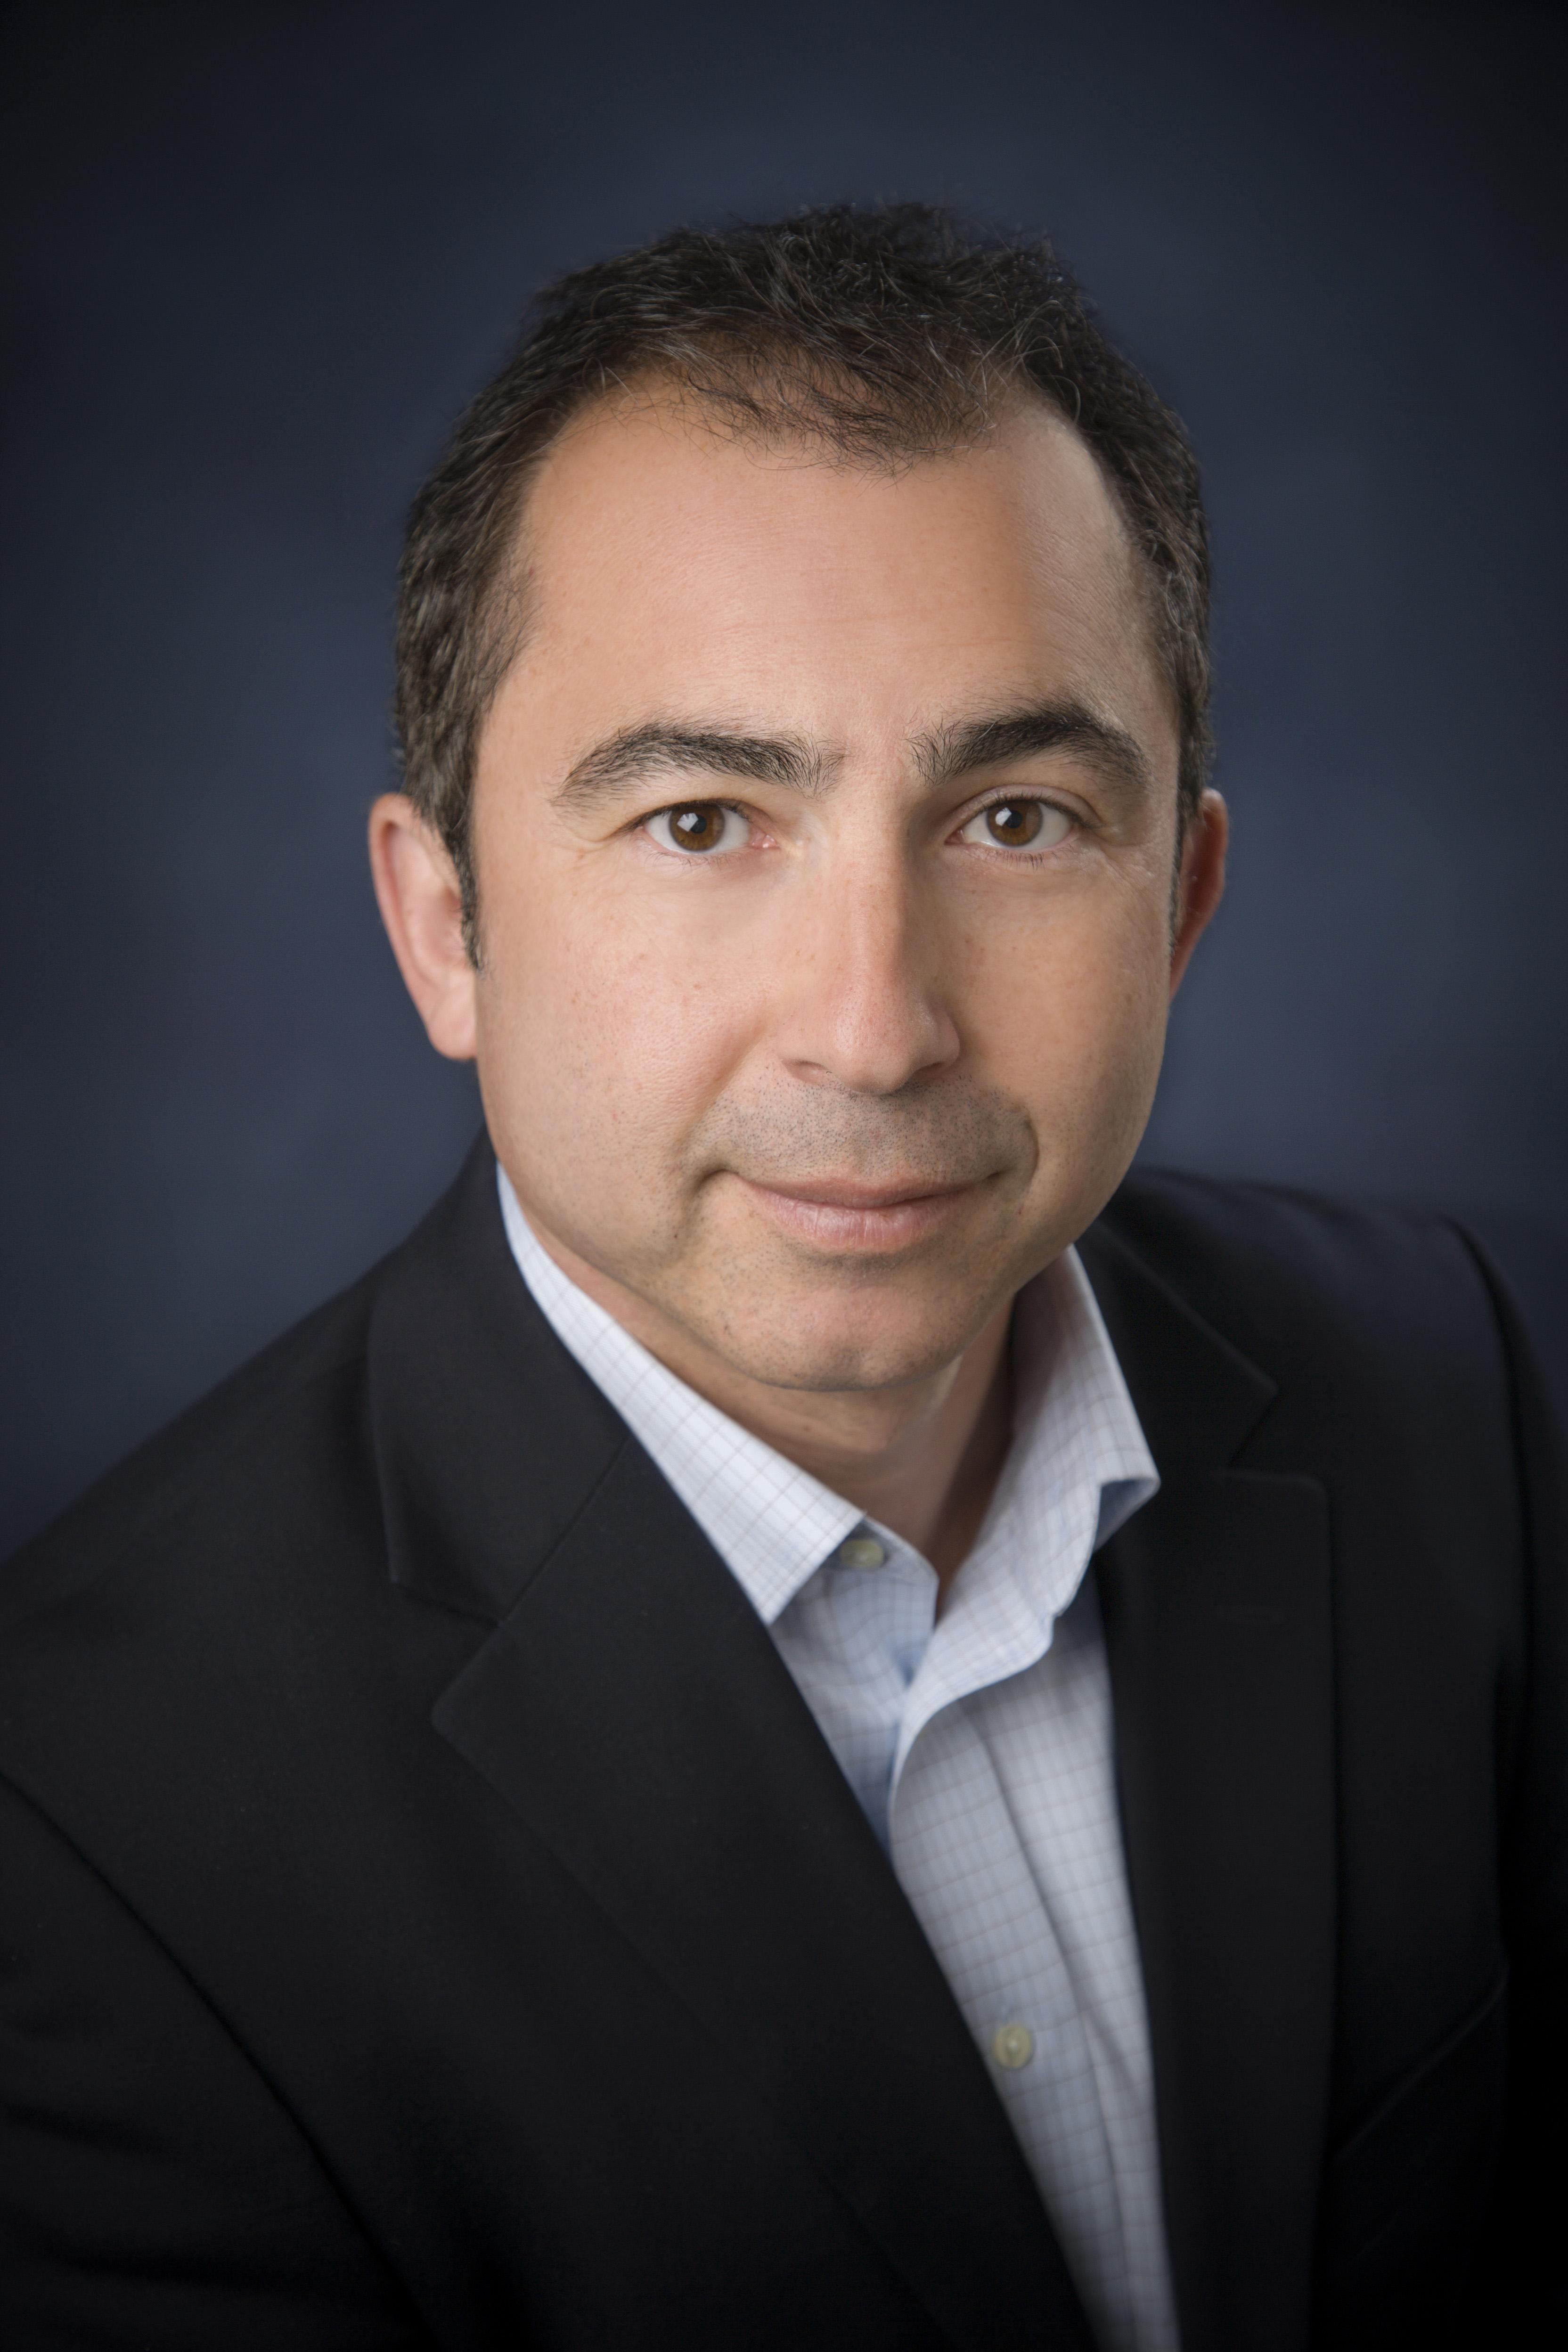 Farid Firouzbakht